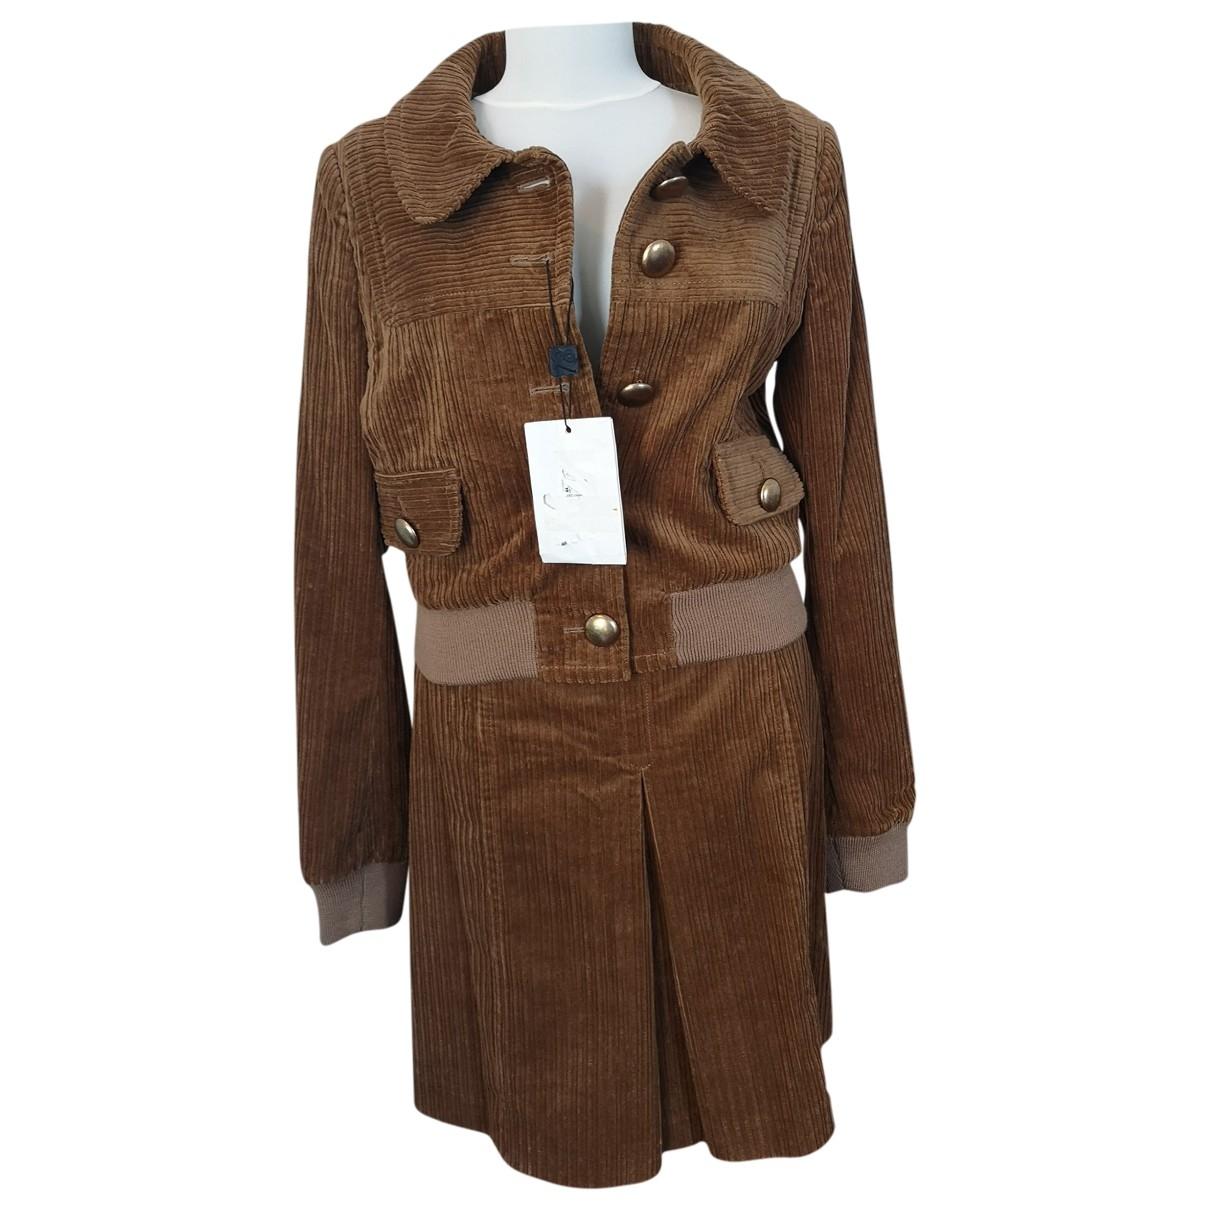 D&g \N Camel Cotton jacket for Women 44 IT